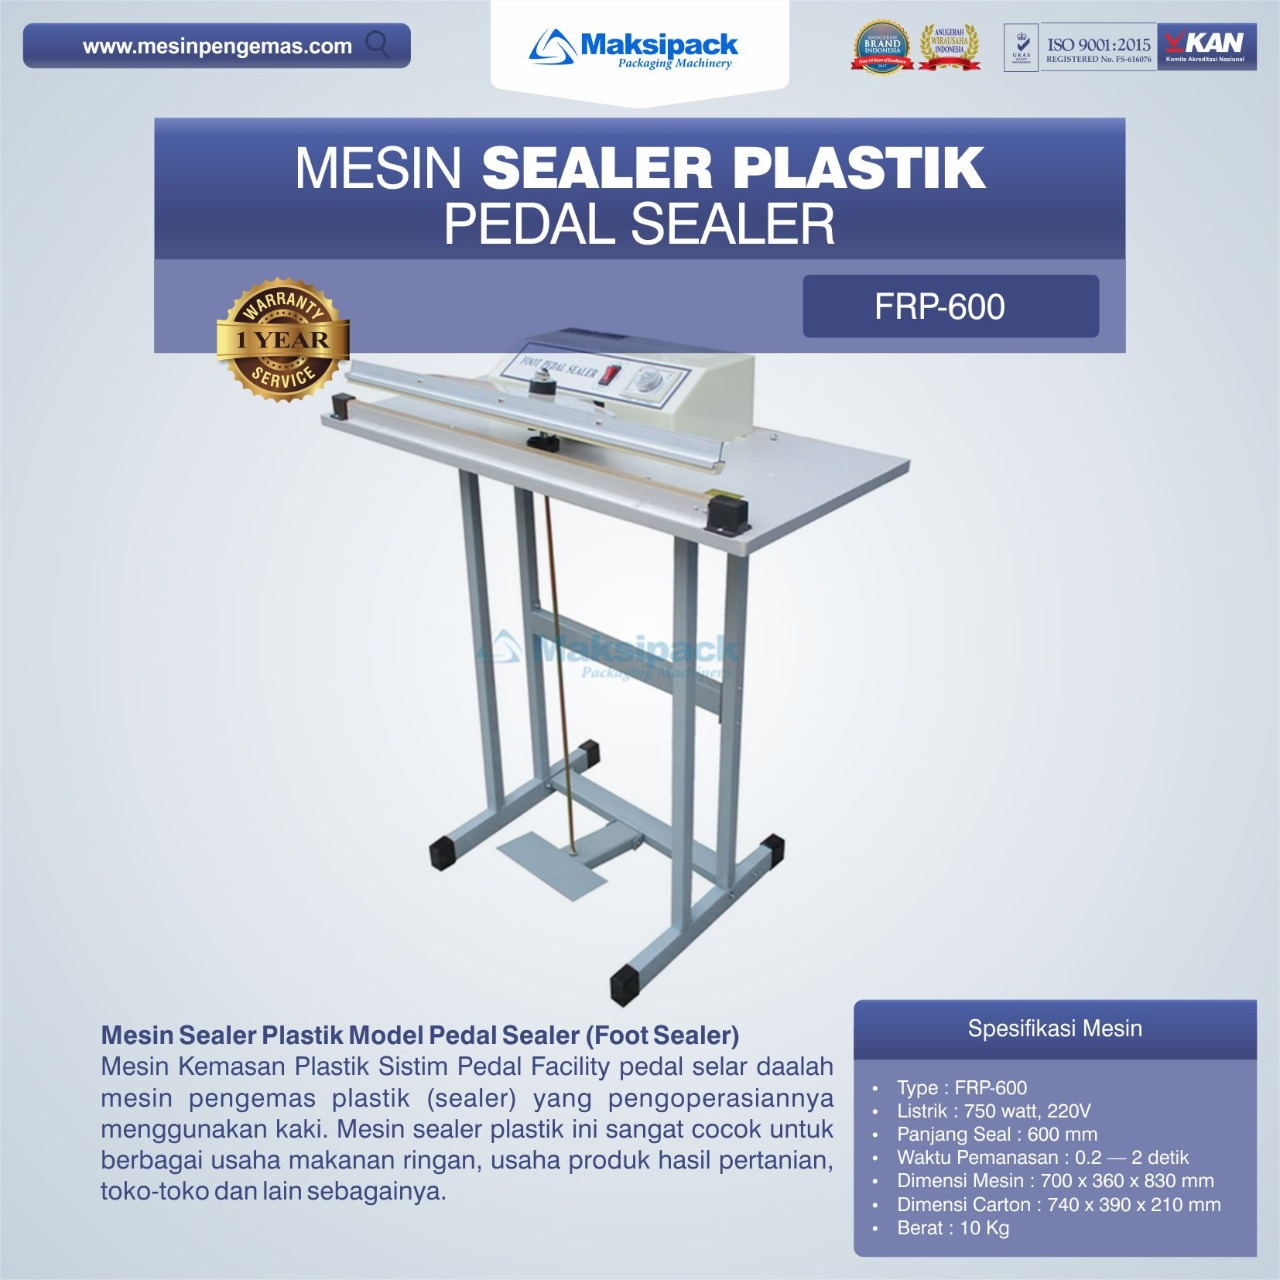 Mesin Sealer Plastik Pedal Sealer FRP-600